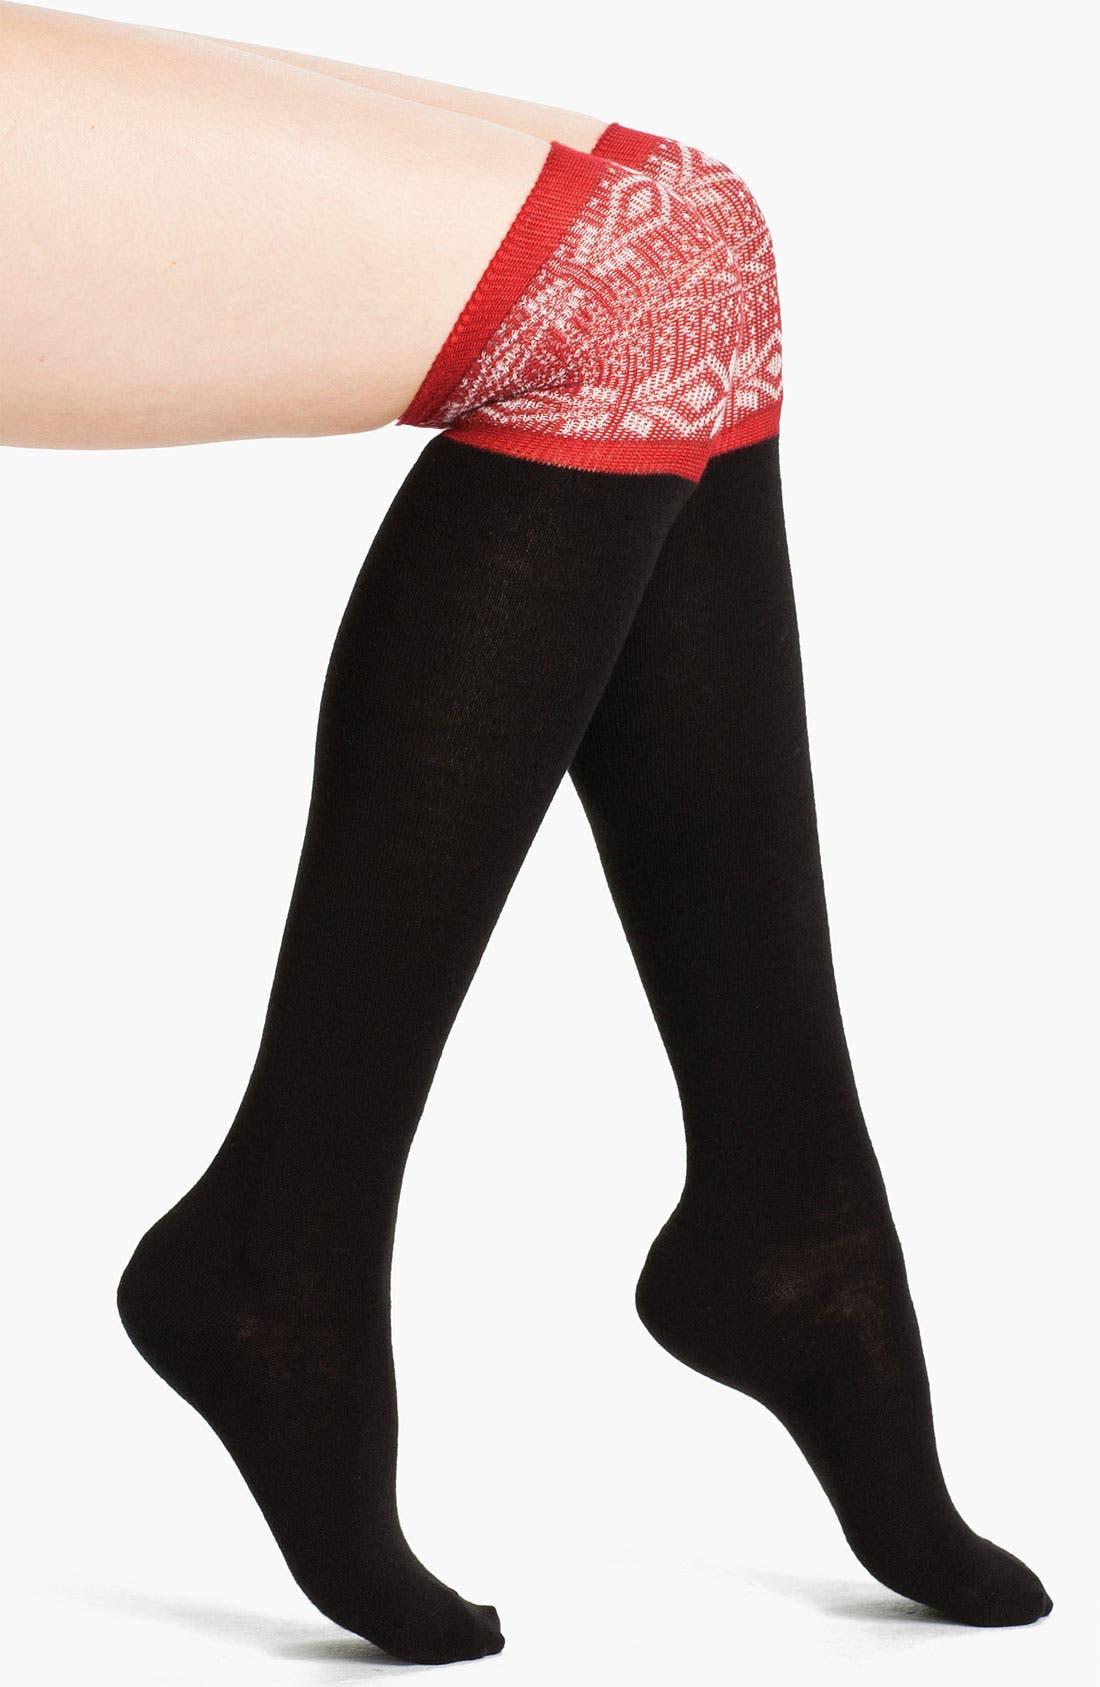 Alternate Image 1 Selected - Hue 'Nordic' Over the Knee Socks